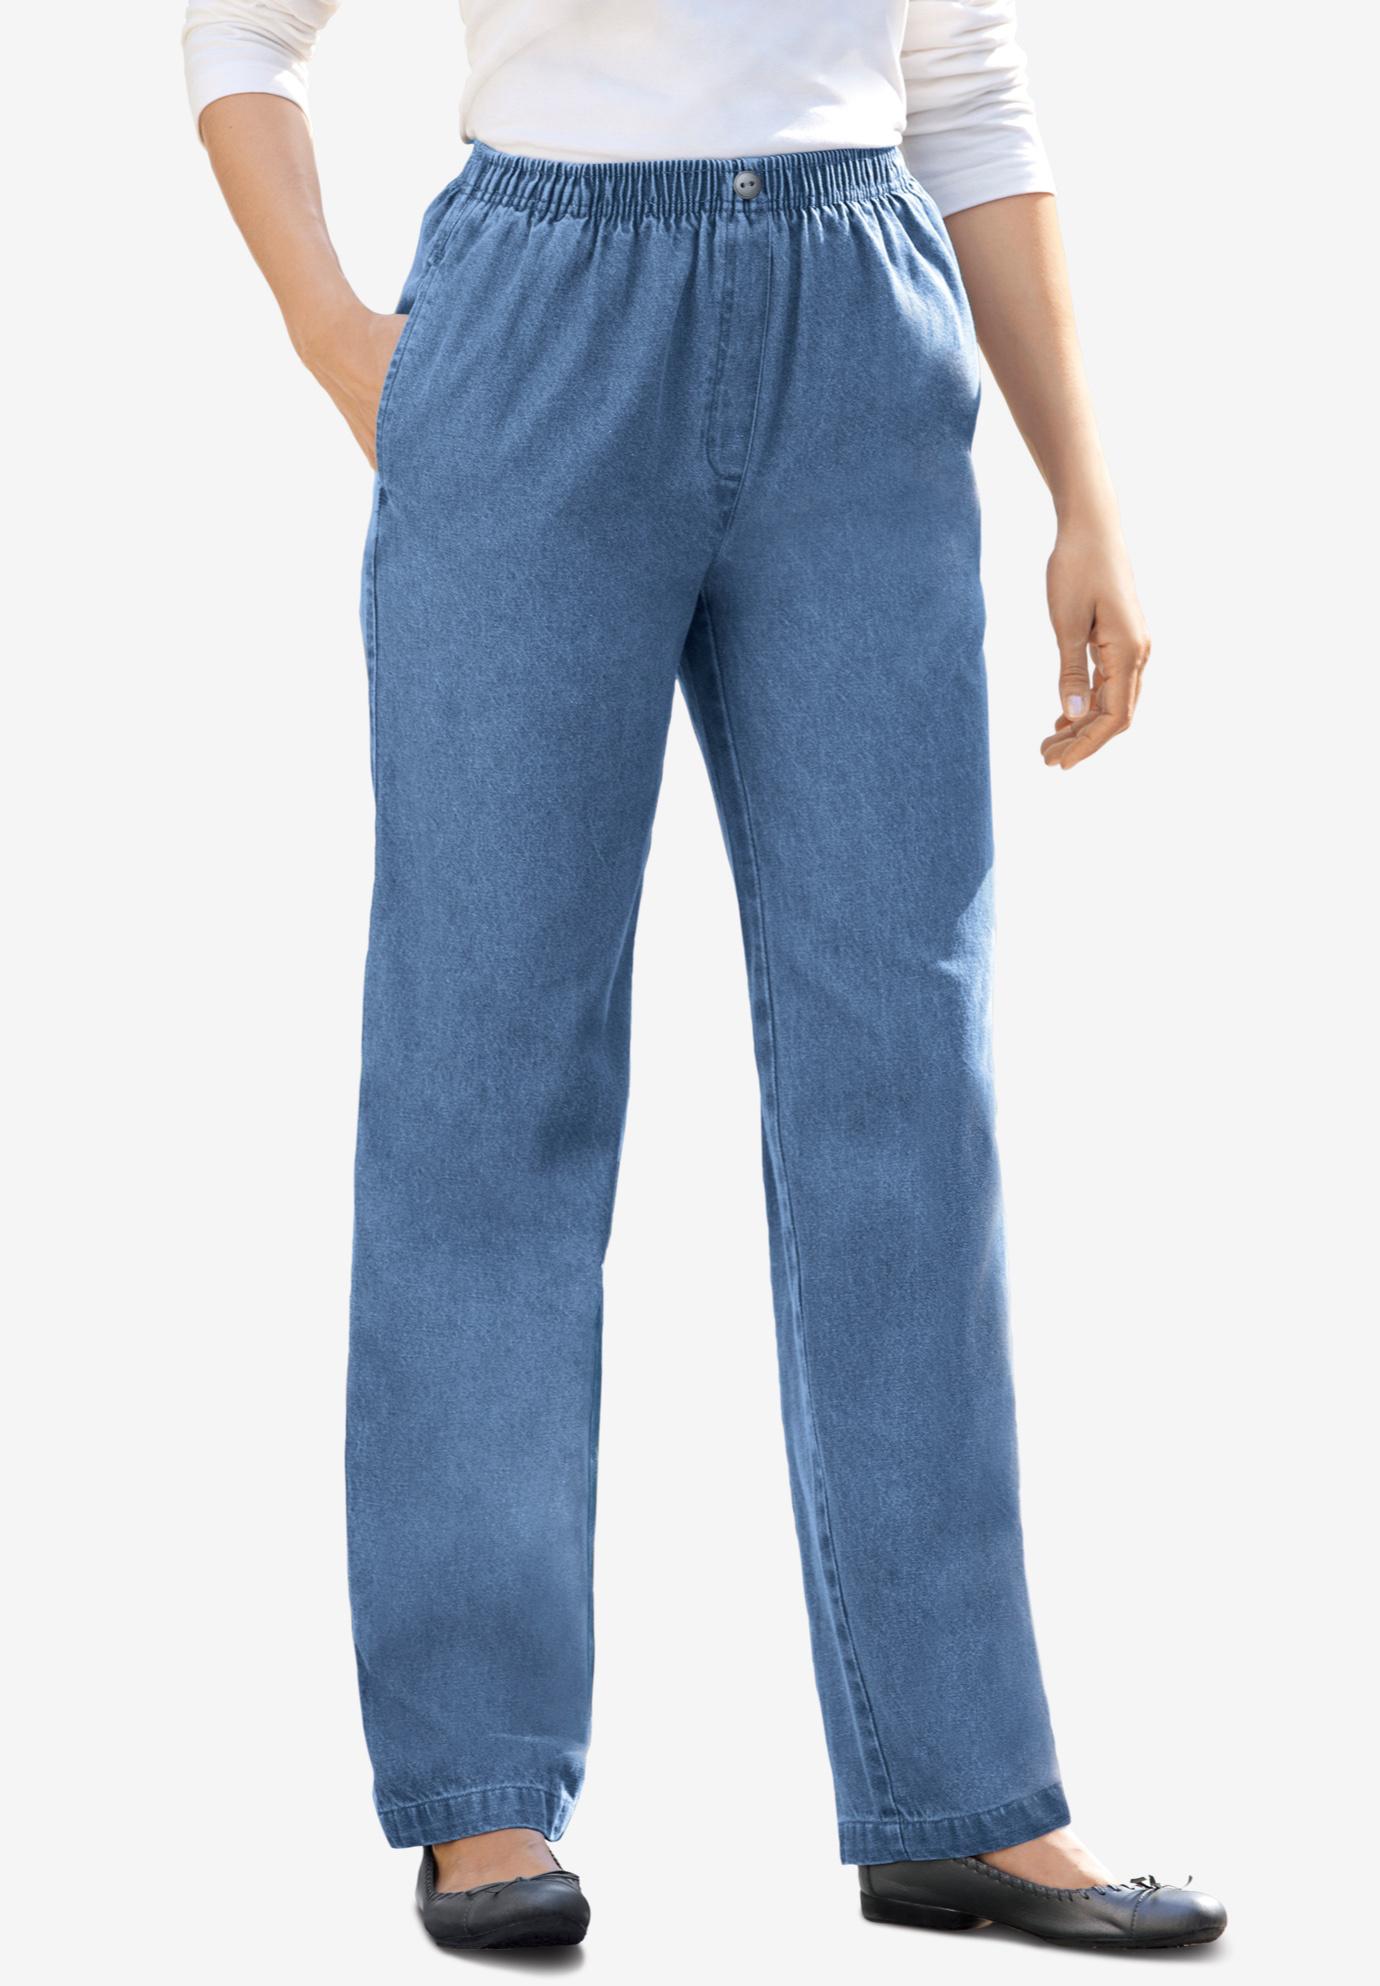 Elastic-Waist Cotton Straight Leg Pant| Plus Size Petite | Full Beauty